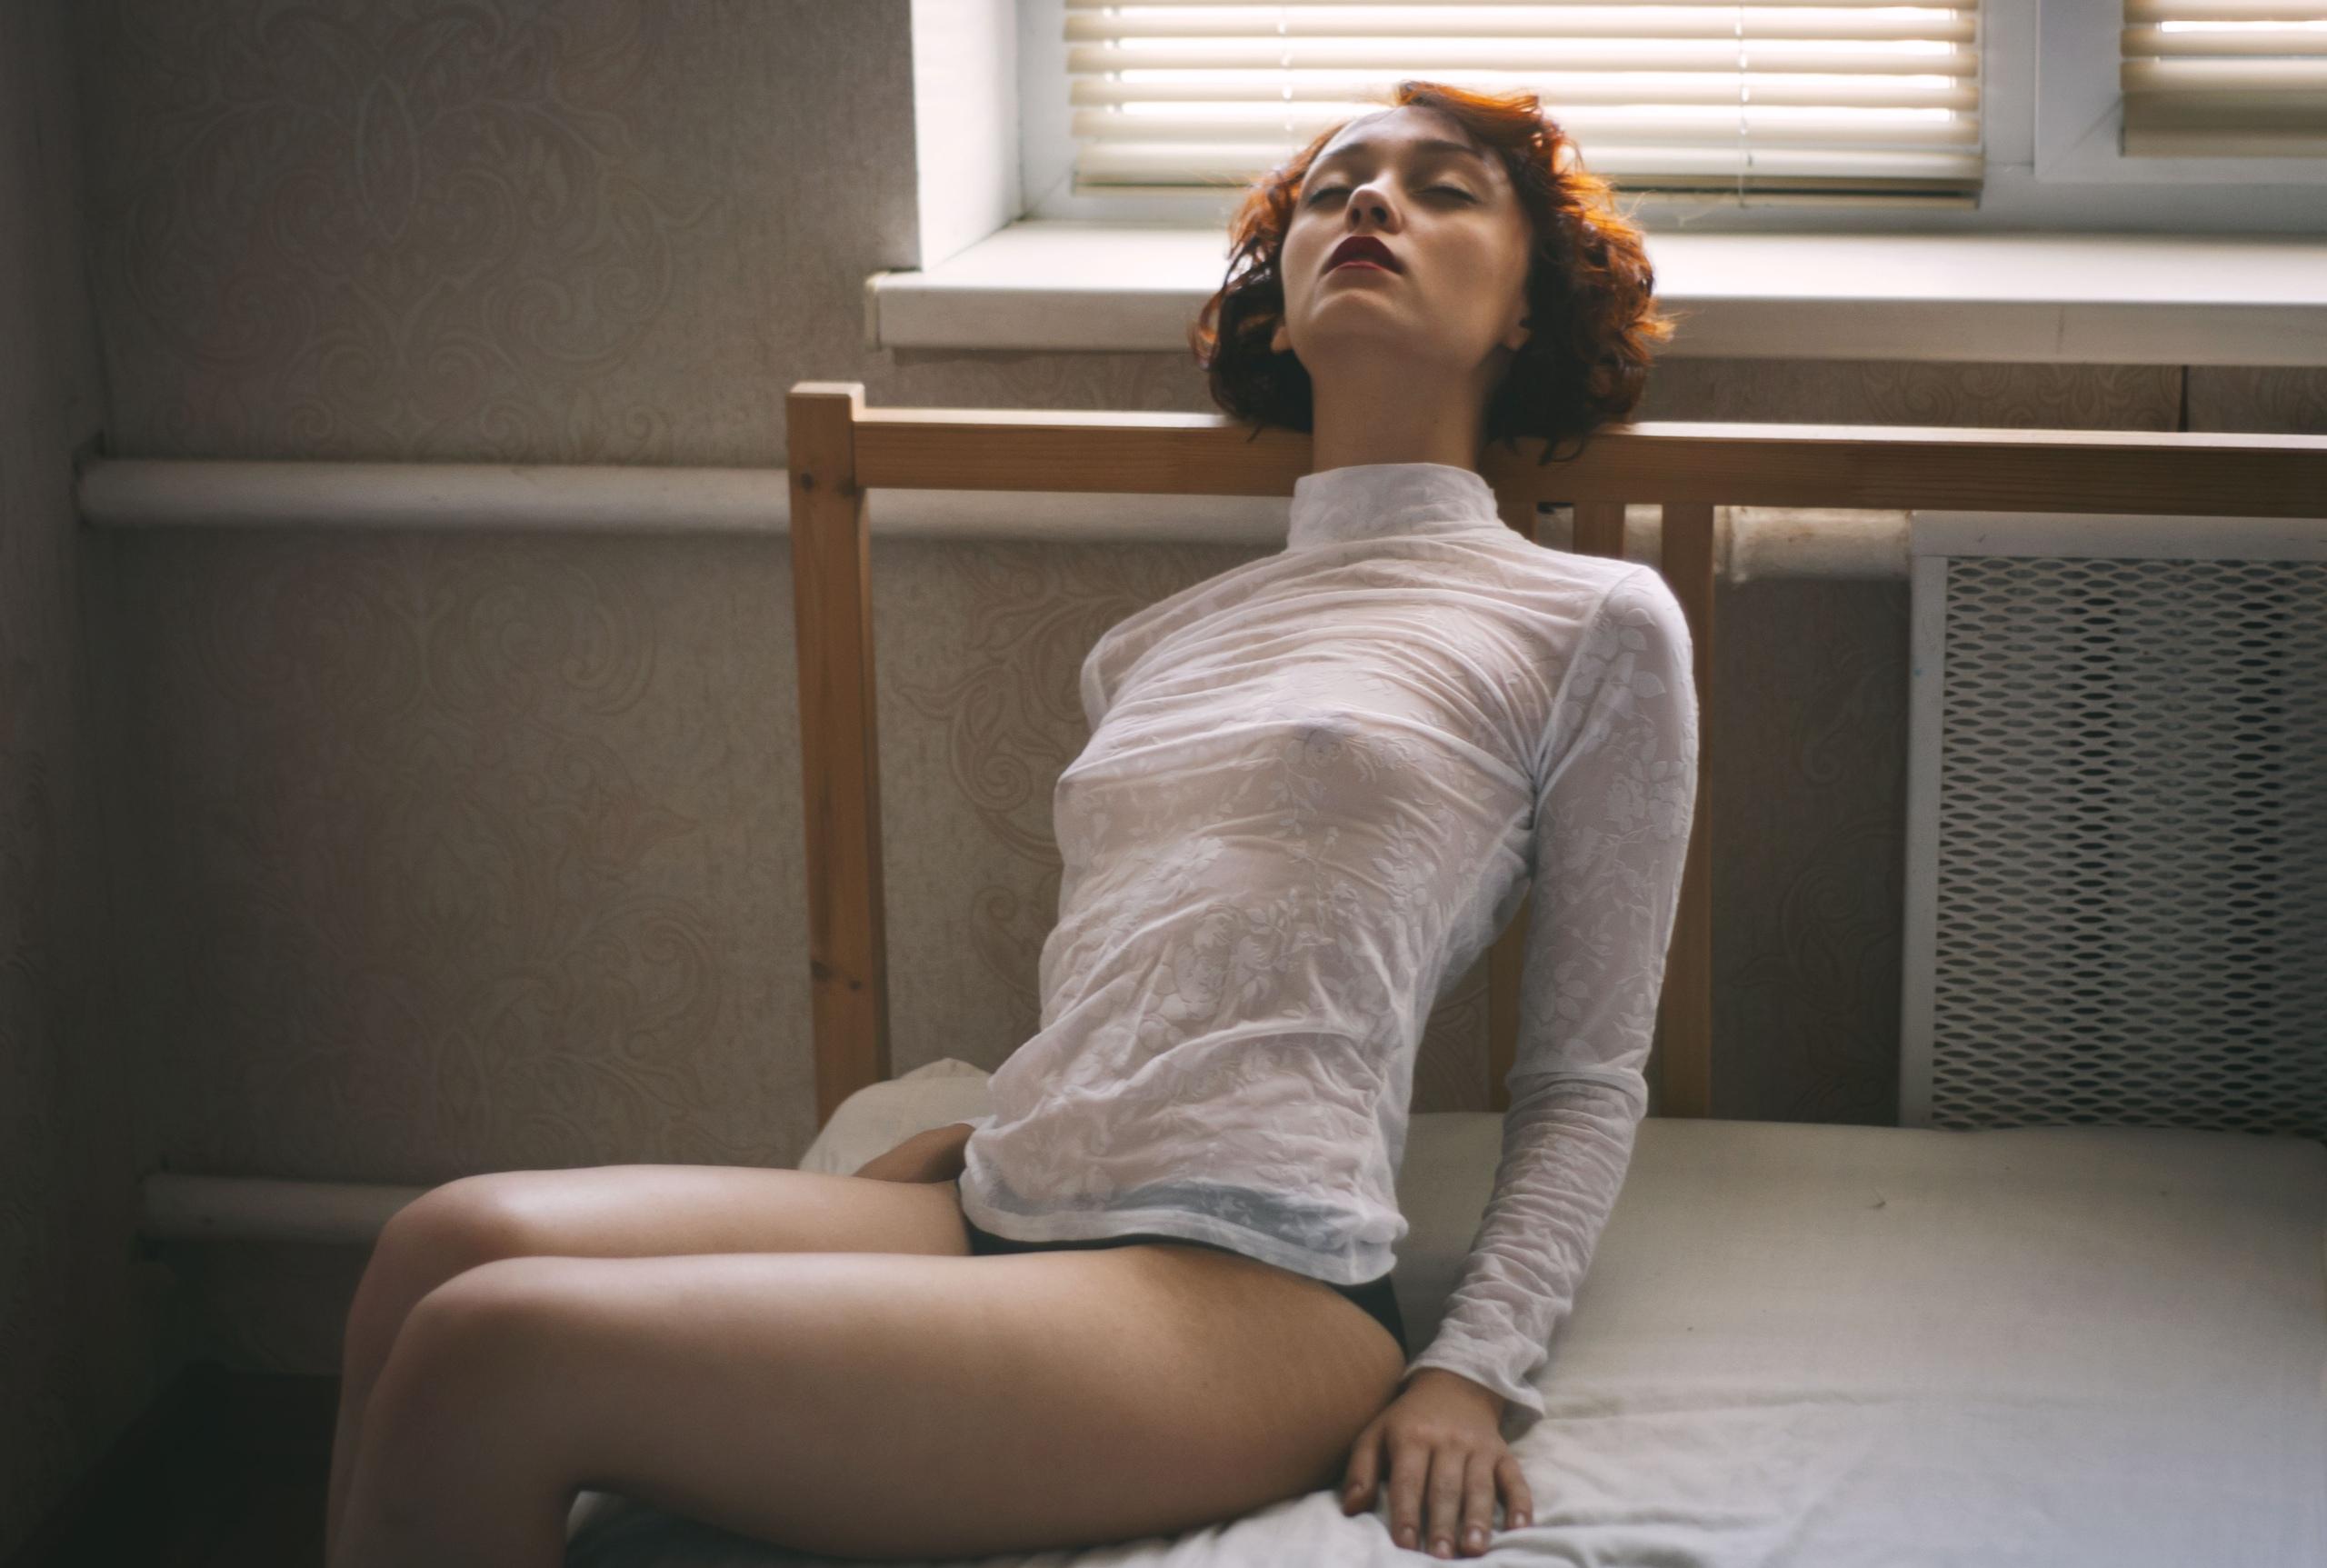 https://www.youngfolks.ru/pub/model-lolita-west-model-natalya-bulavkina